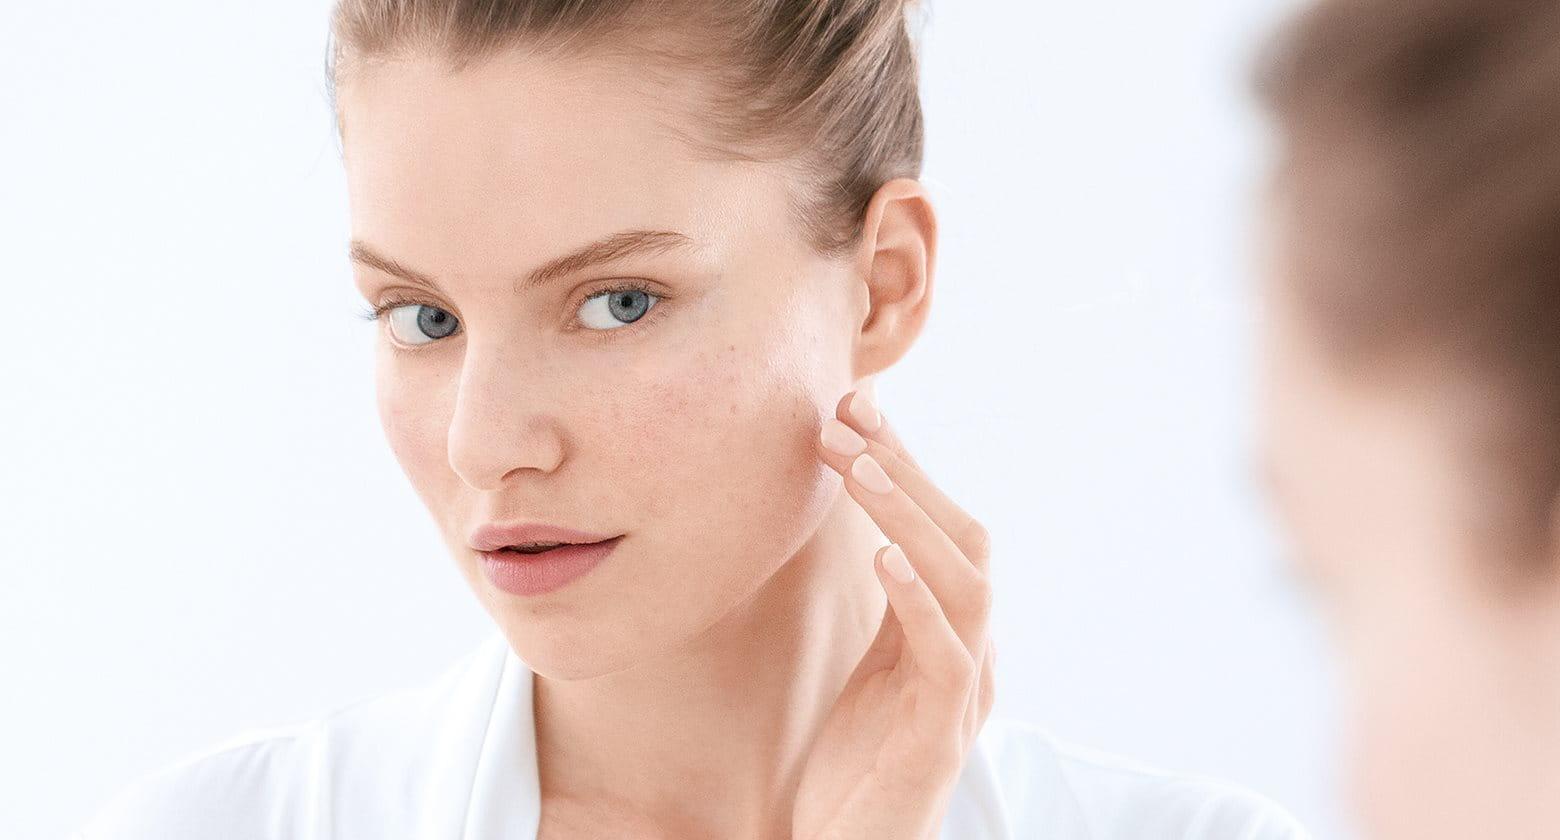 Pimples, blackheads and blemish-prone skin